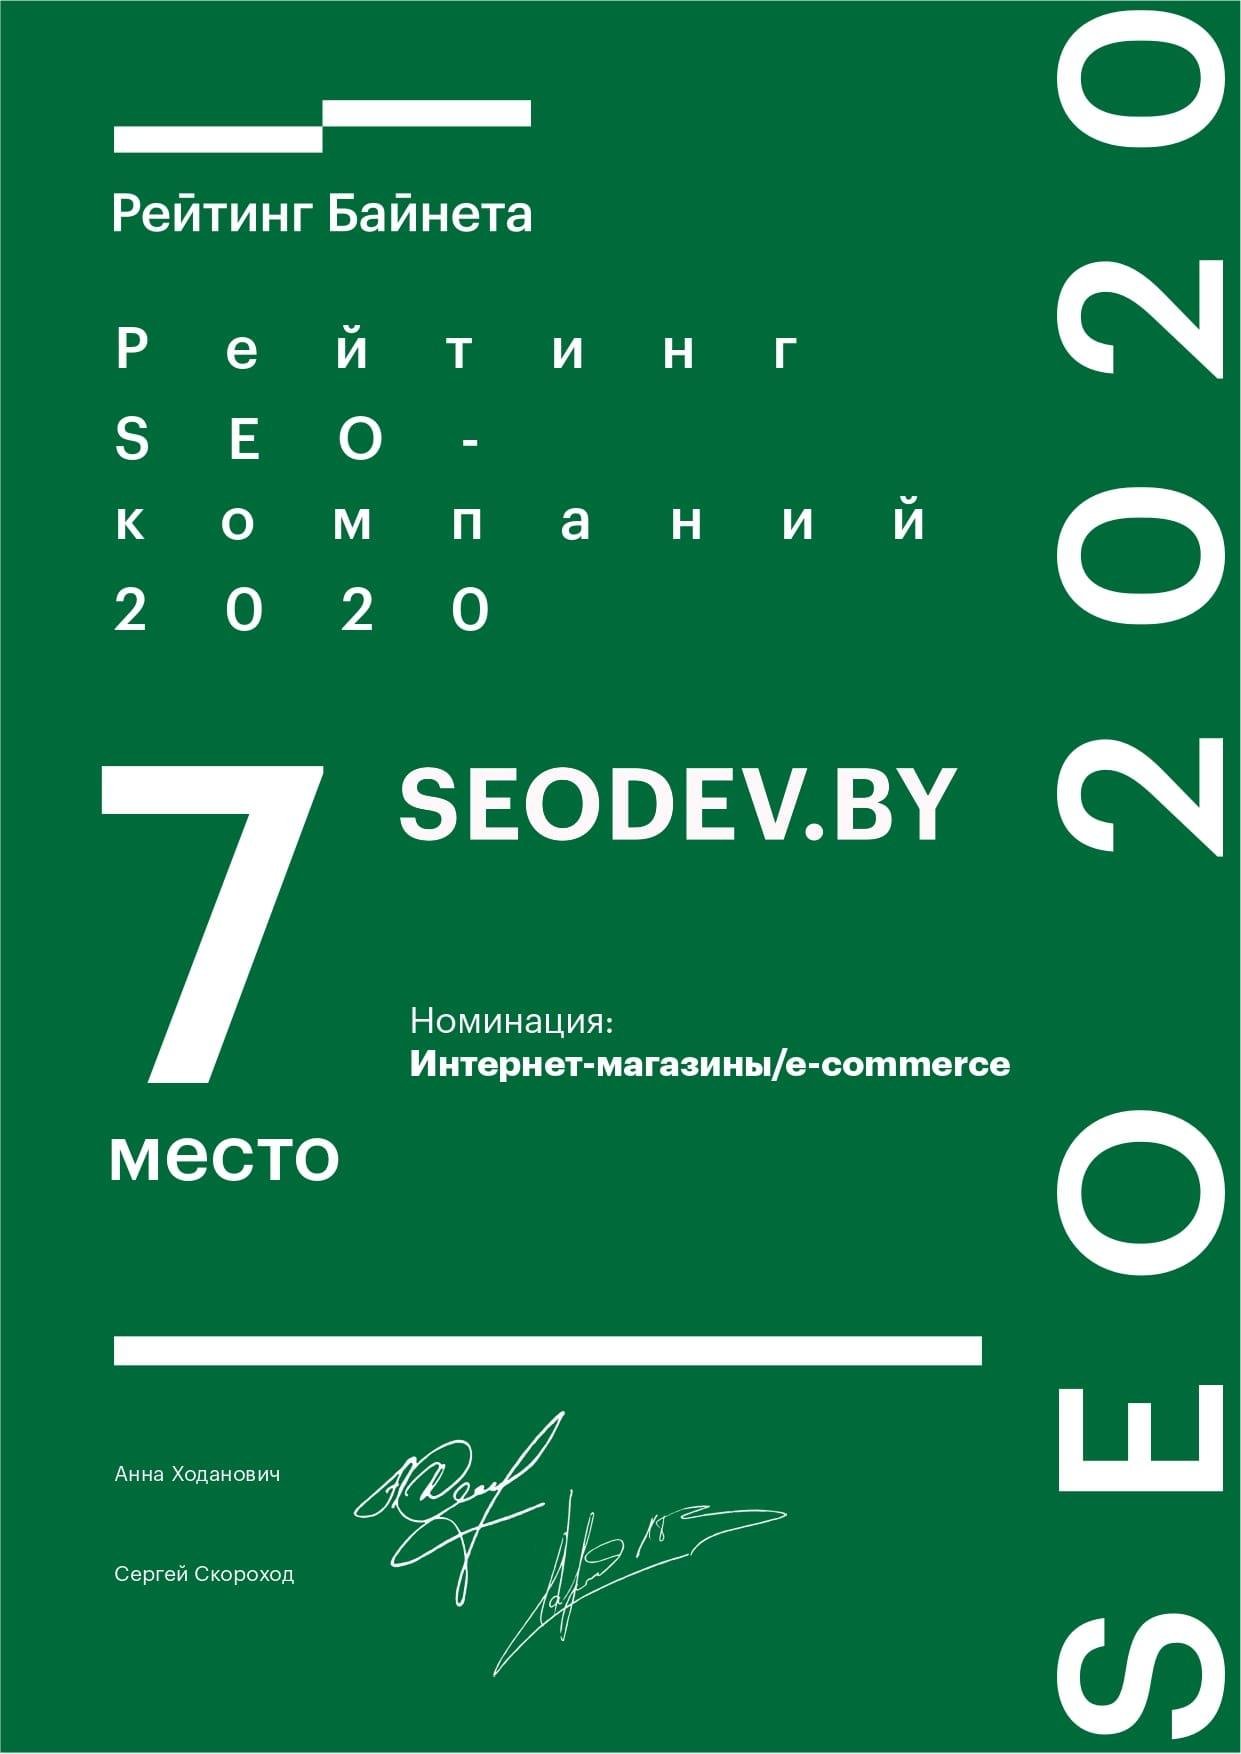 SEO_spec_page-0004